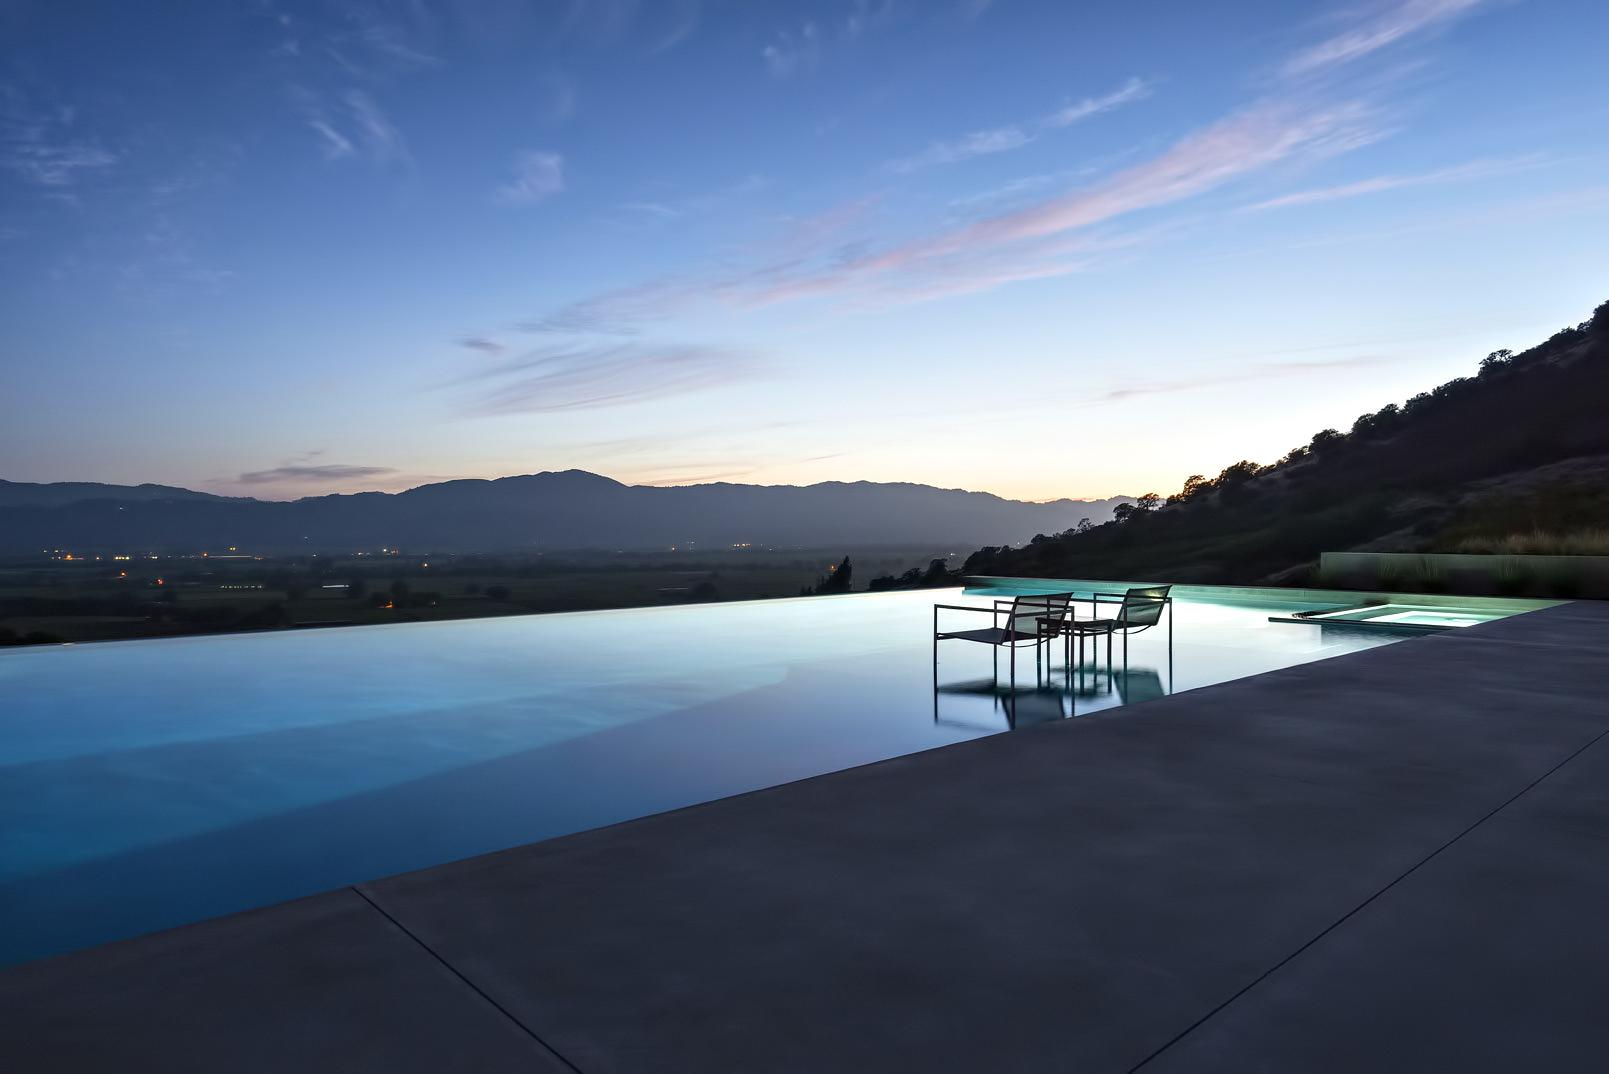 Napa Valley Luxury Residence – Silverado Trail, Napa, CA, USA